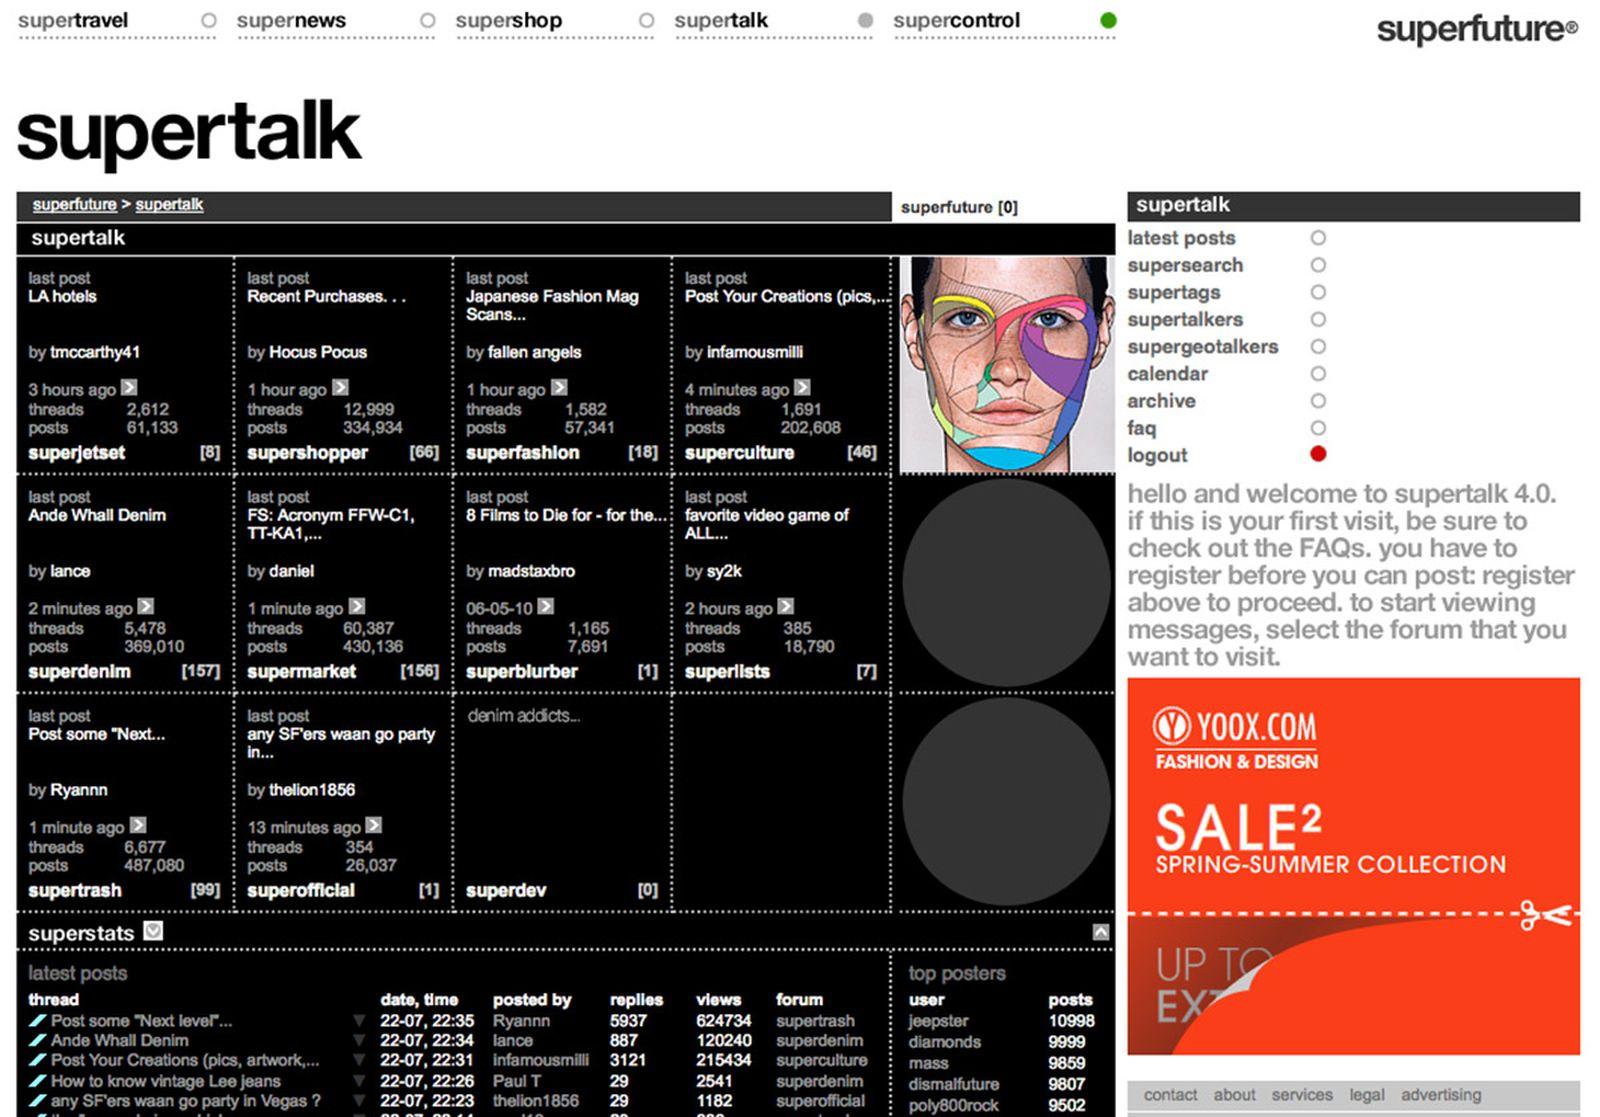 superfuture website screenshot archive